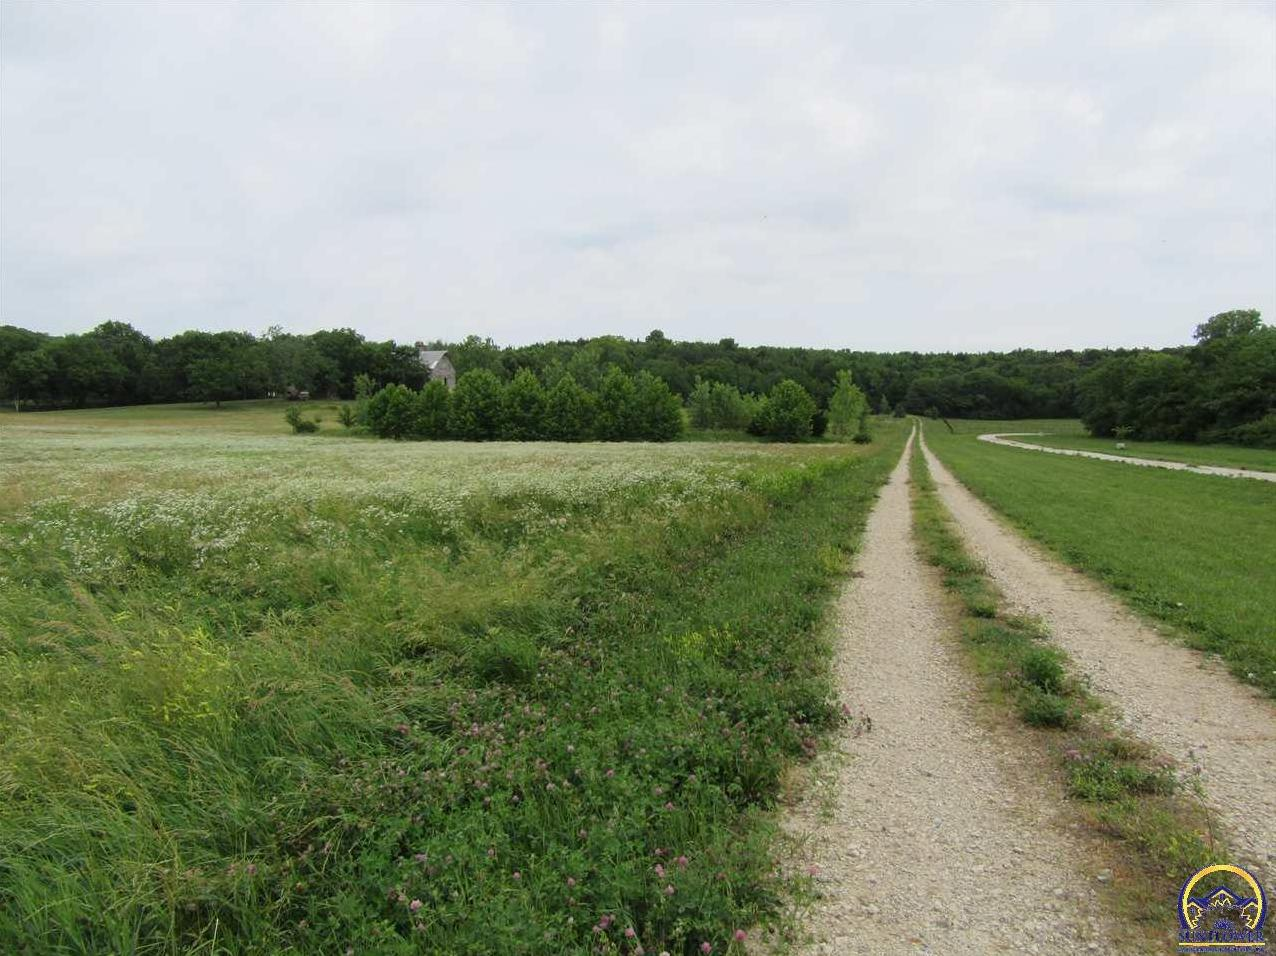 Photo of Land 1500 Blk 600 Rd Baldwin City KS 66006